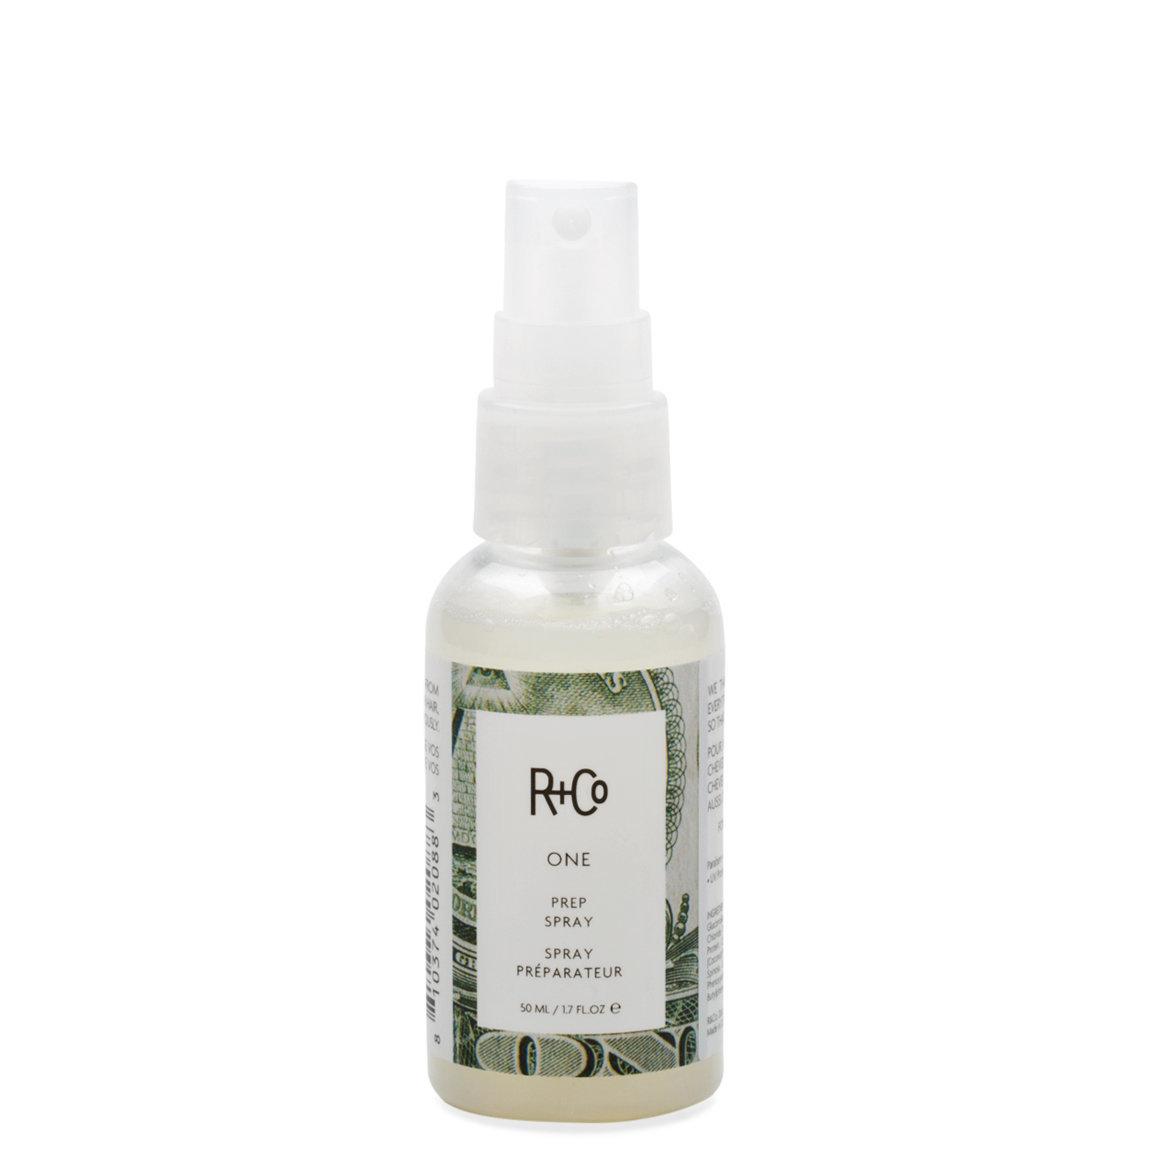 R+Co One Prep Spray 1.7 oz product swatch.